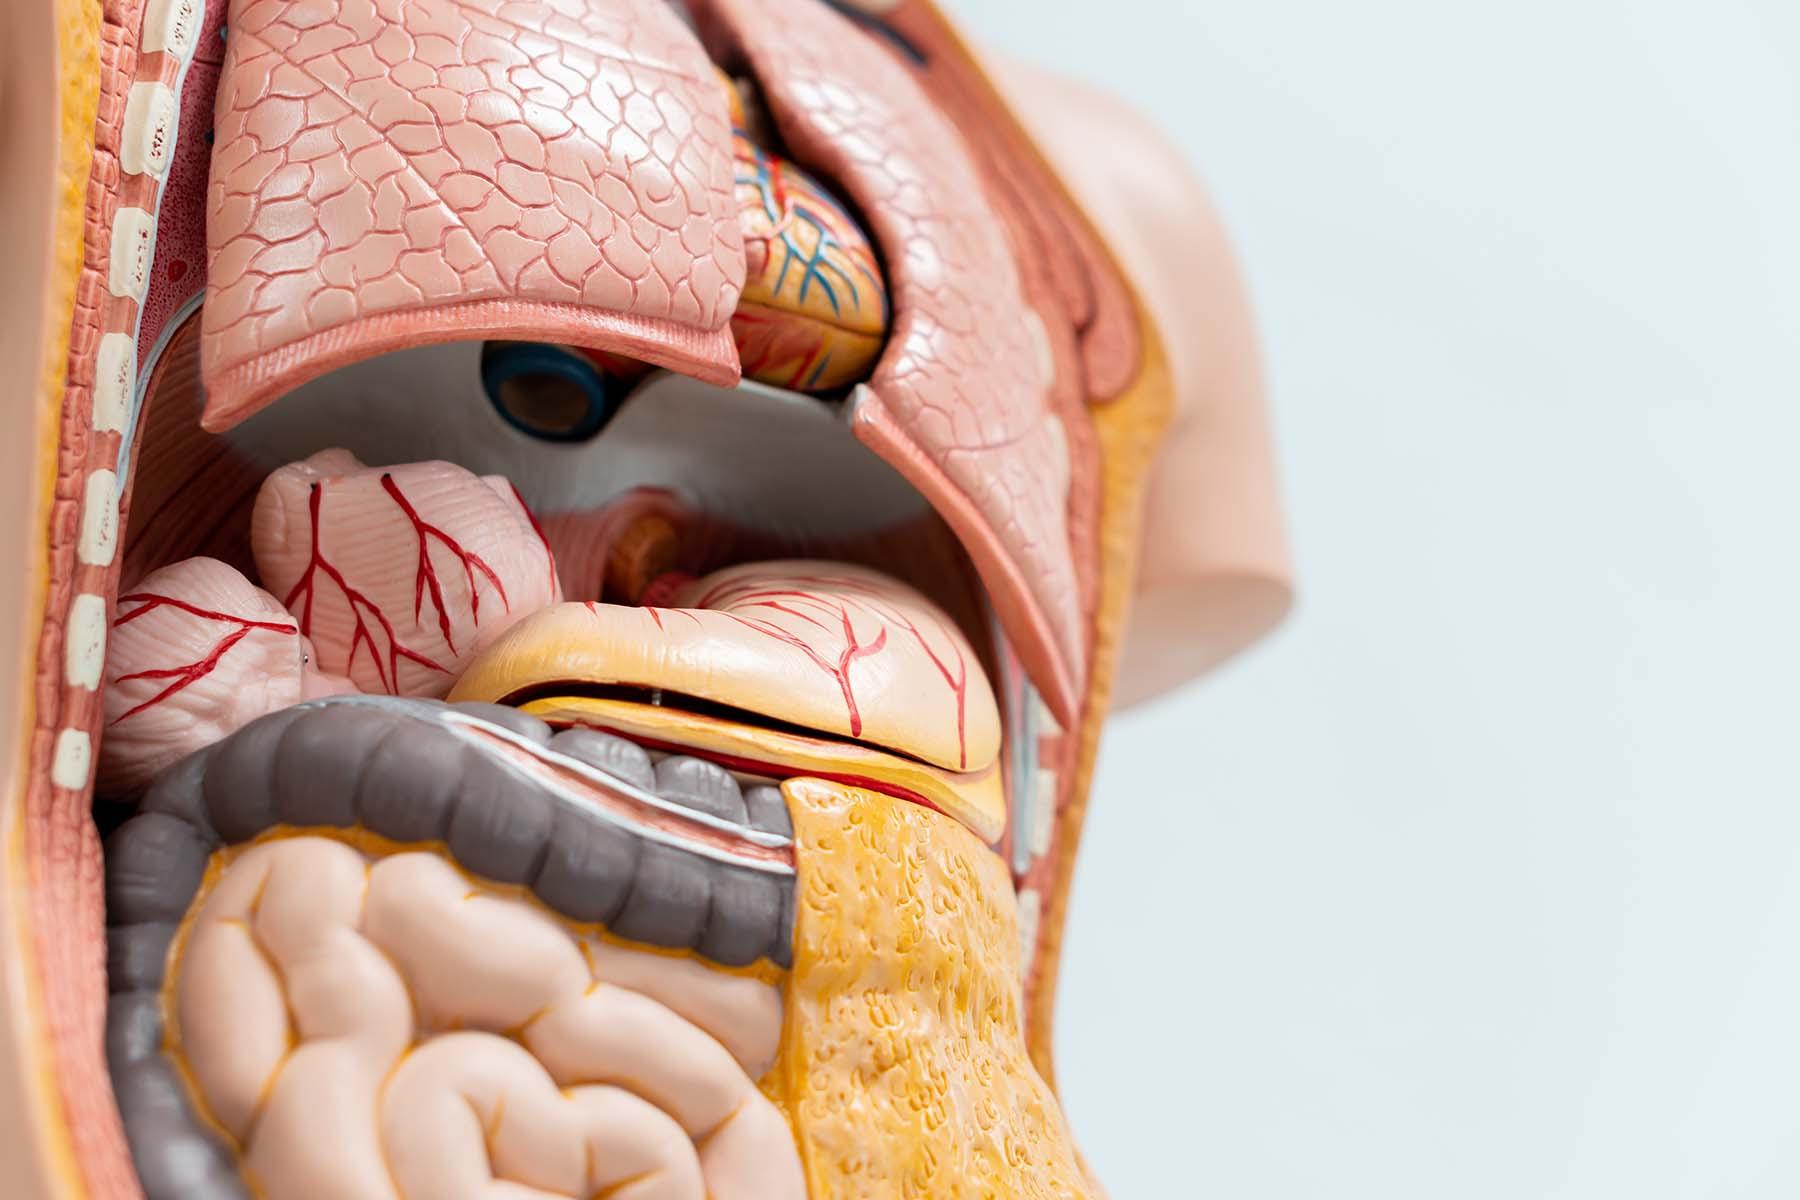 Organmodelle